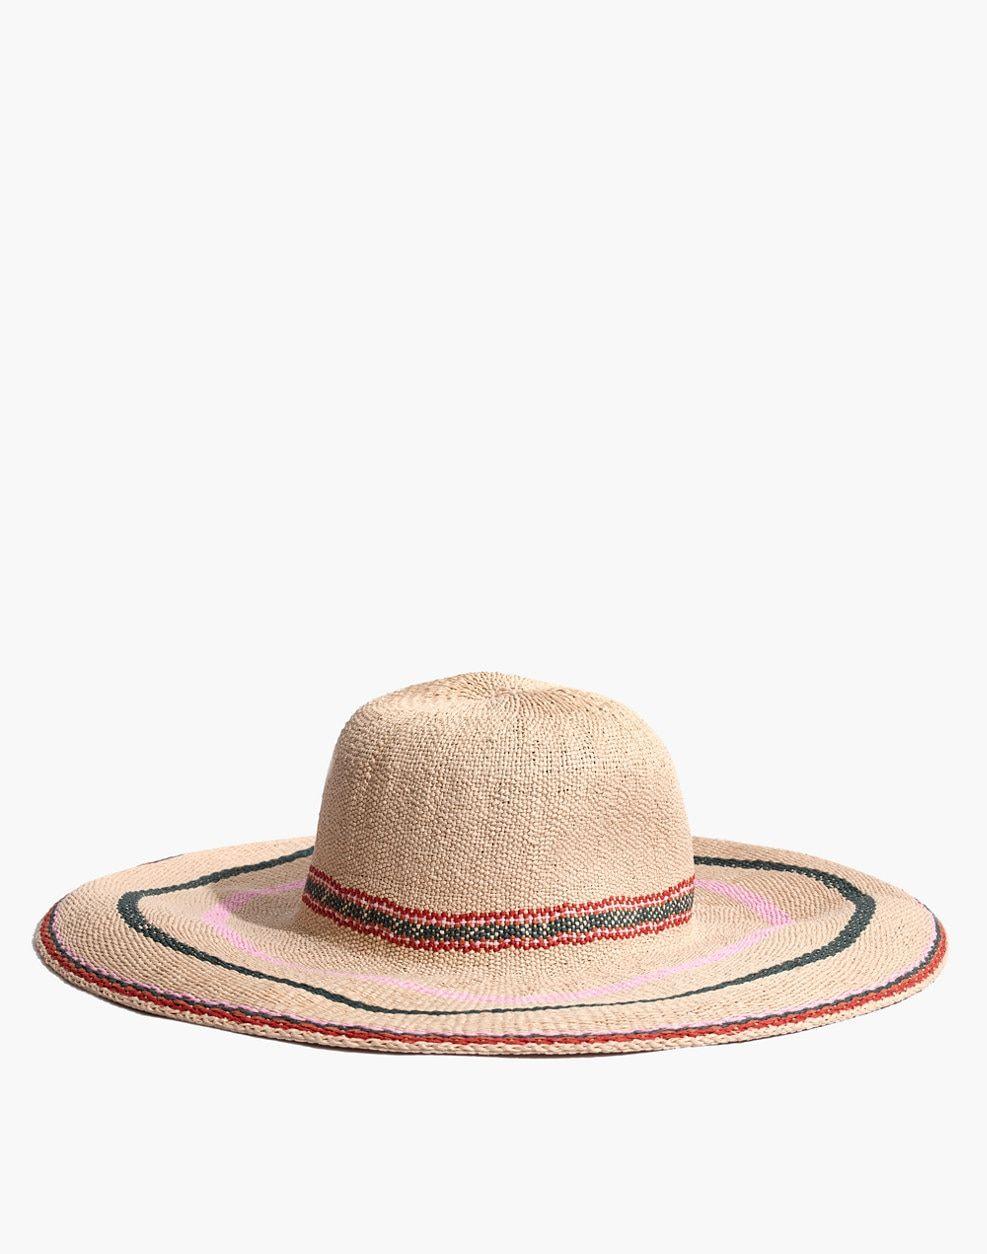 ac531c482a3 Madewell x Biltmore® Tulum Striped Straw Hat   hats